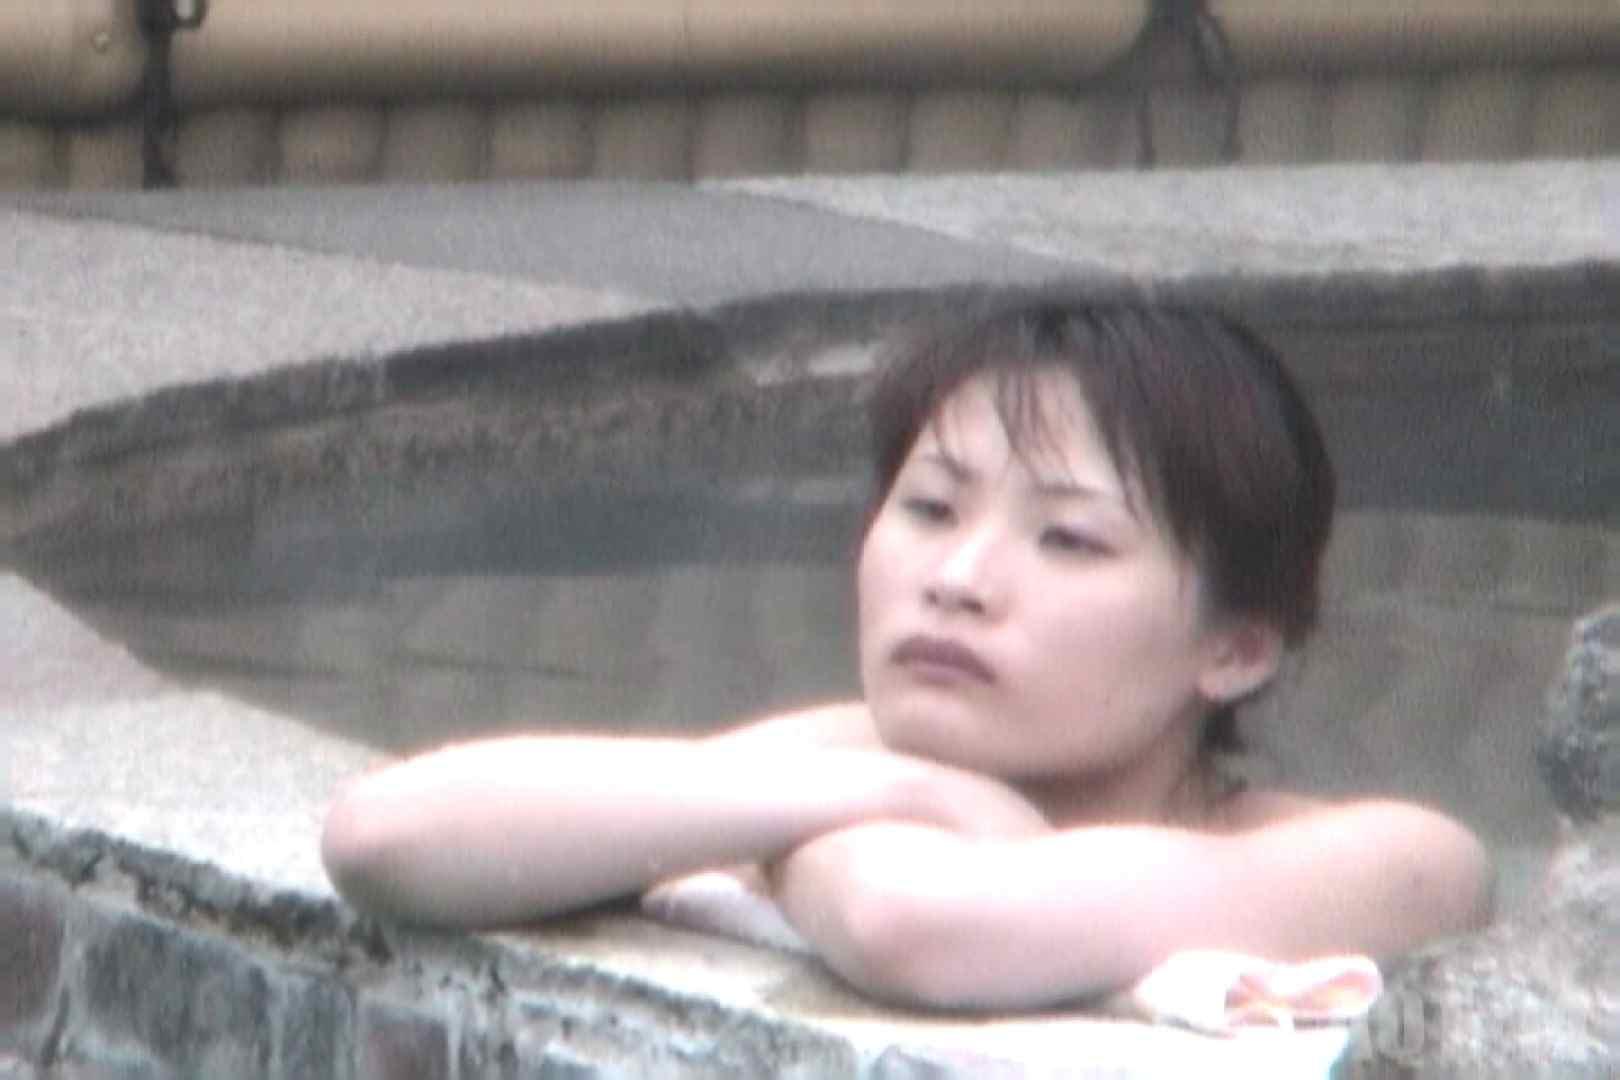 Aquaな露天風呂Vol.822 OLのエロ生活   露天風呂  62連発 19